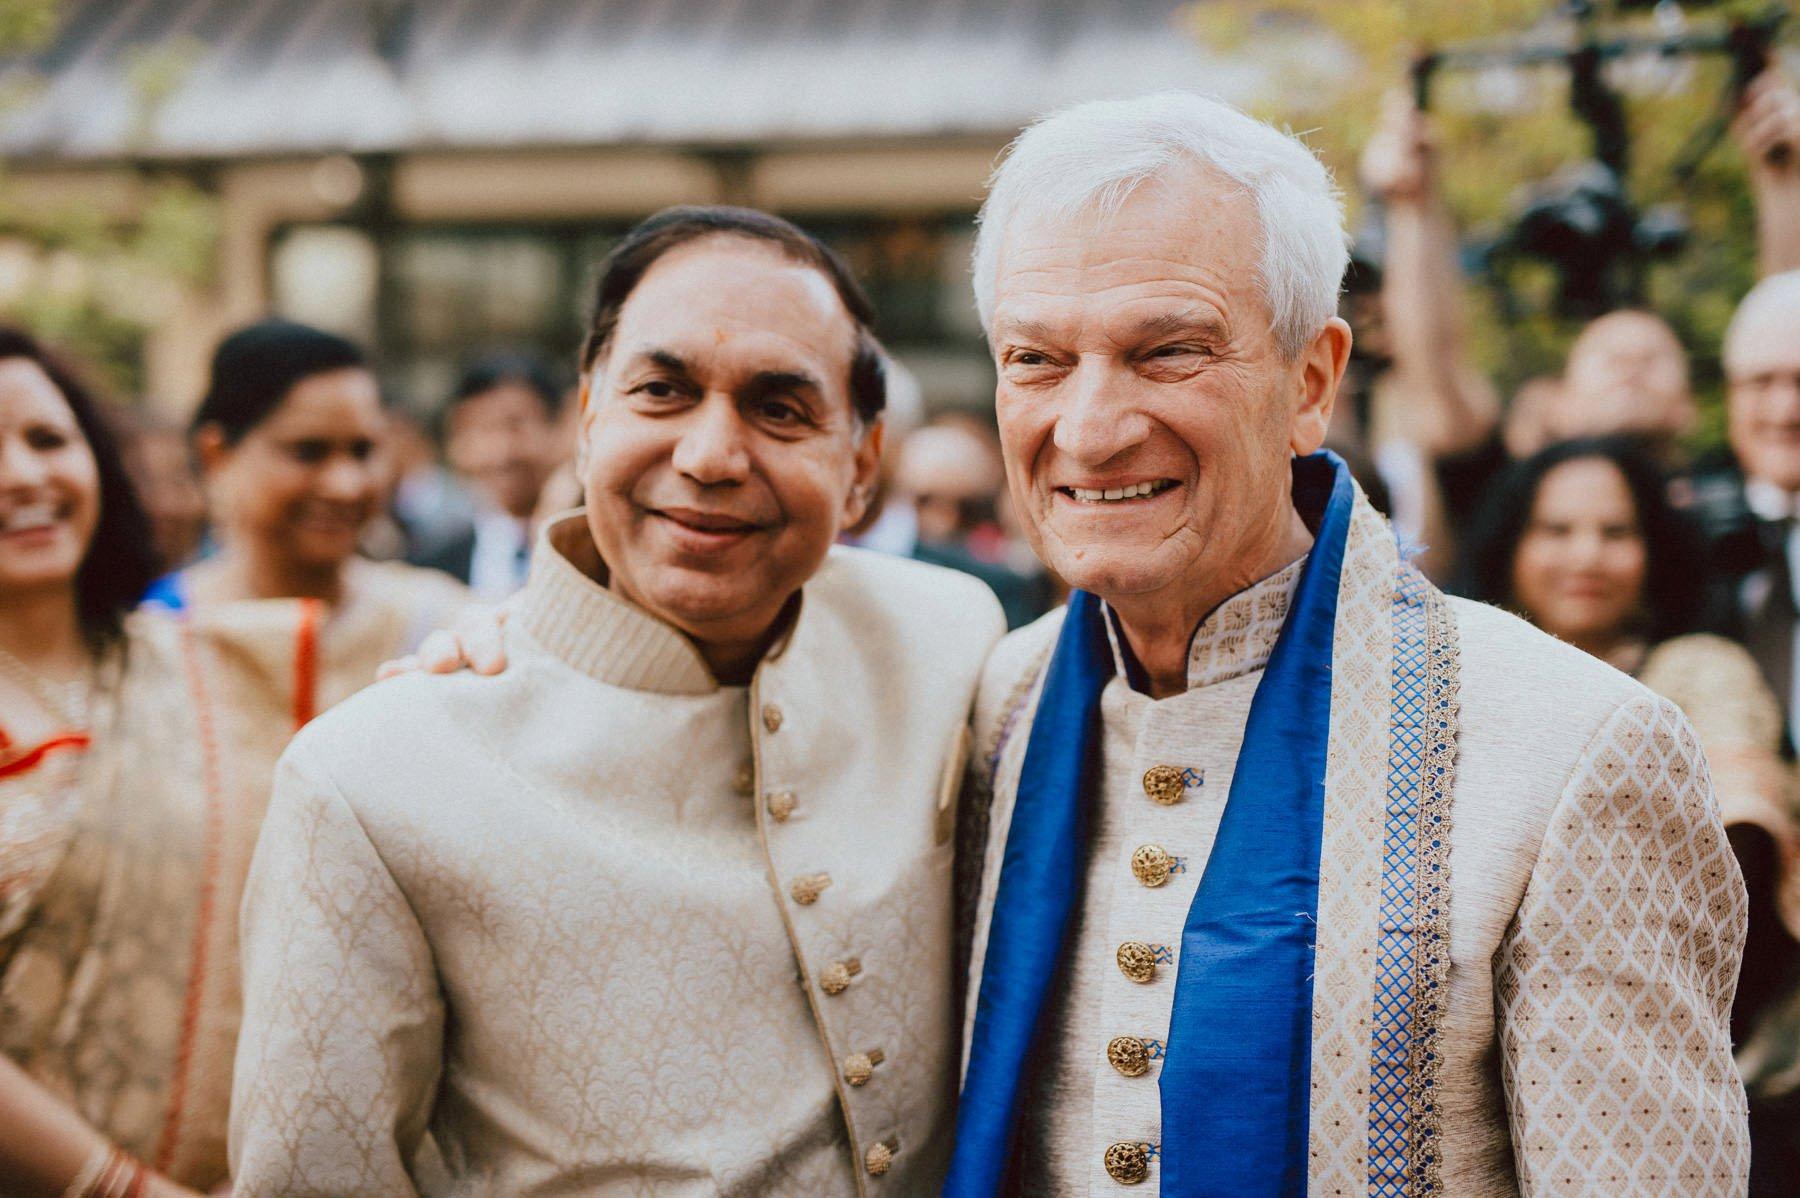 vie-philadelphia-indian-wedding-66.jpg